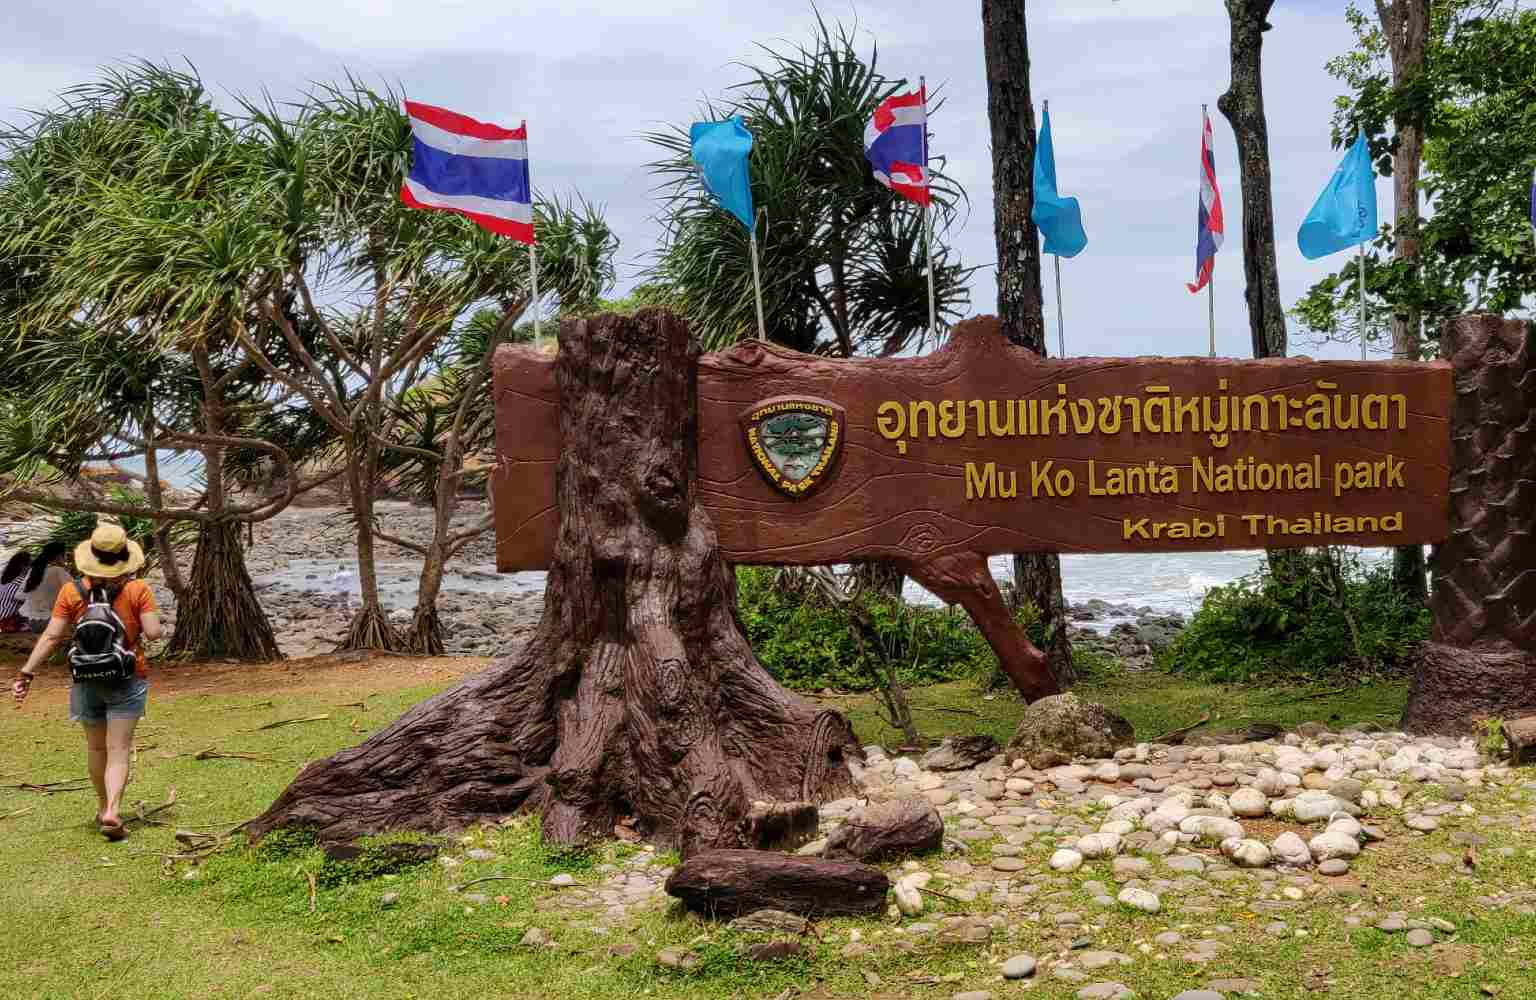 Mu Koh Lanta National Park Bord bij ingang van het park.